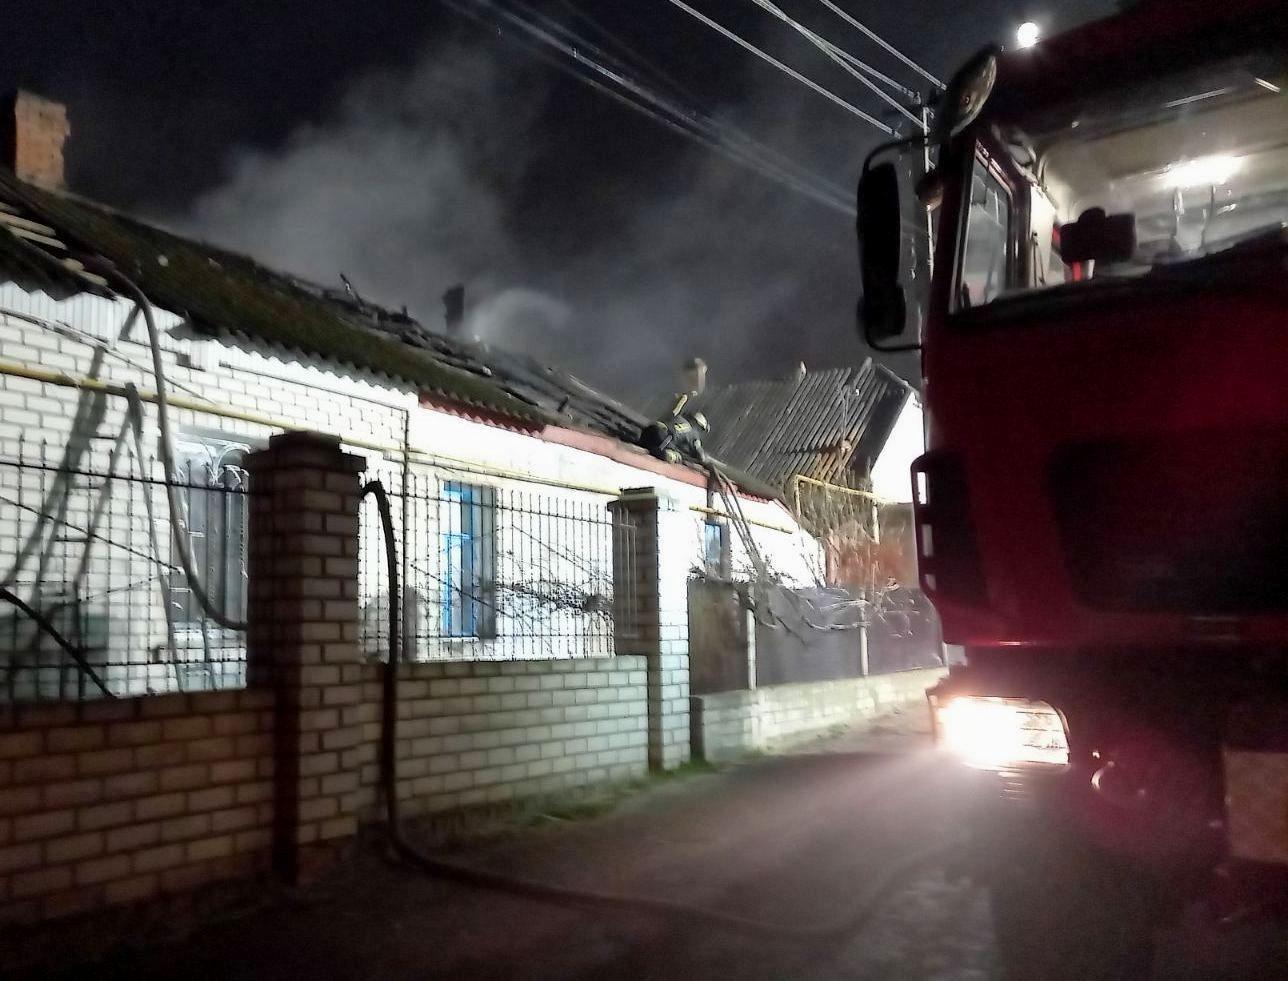 Херсон,пожар дома,электроплитка